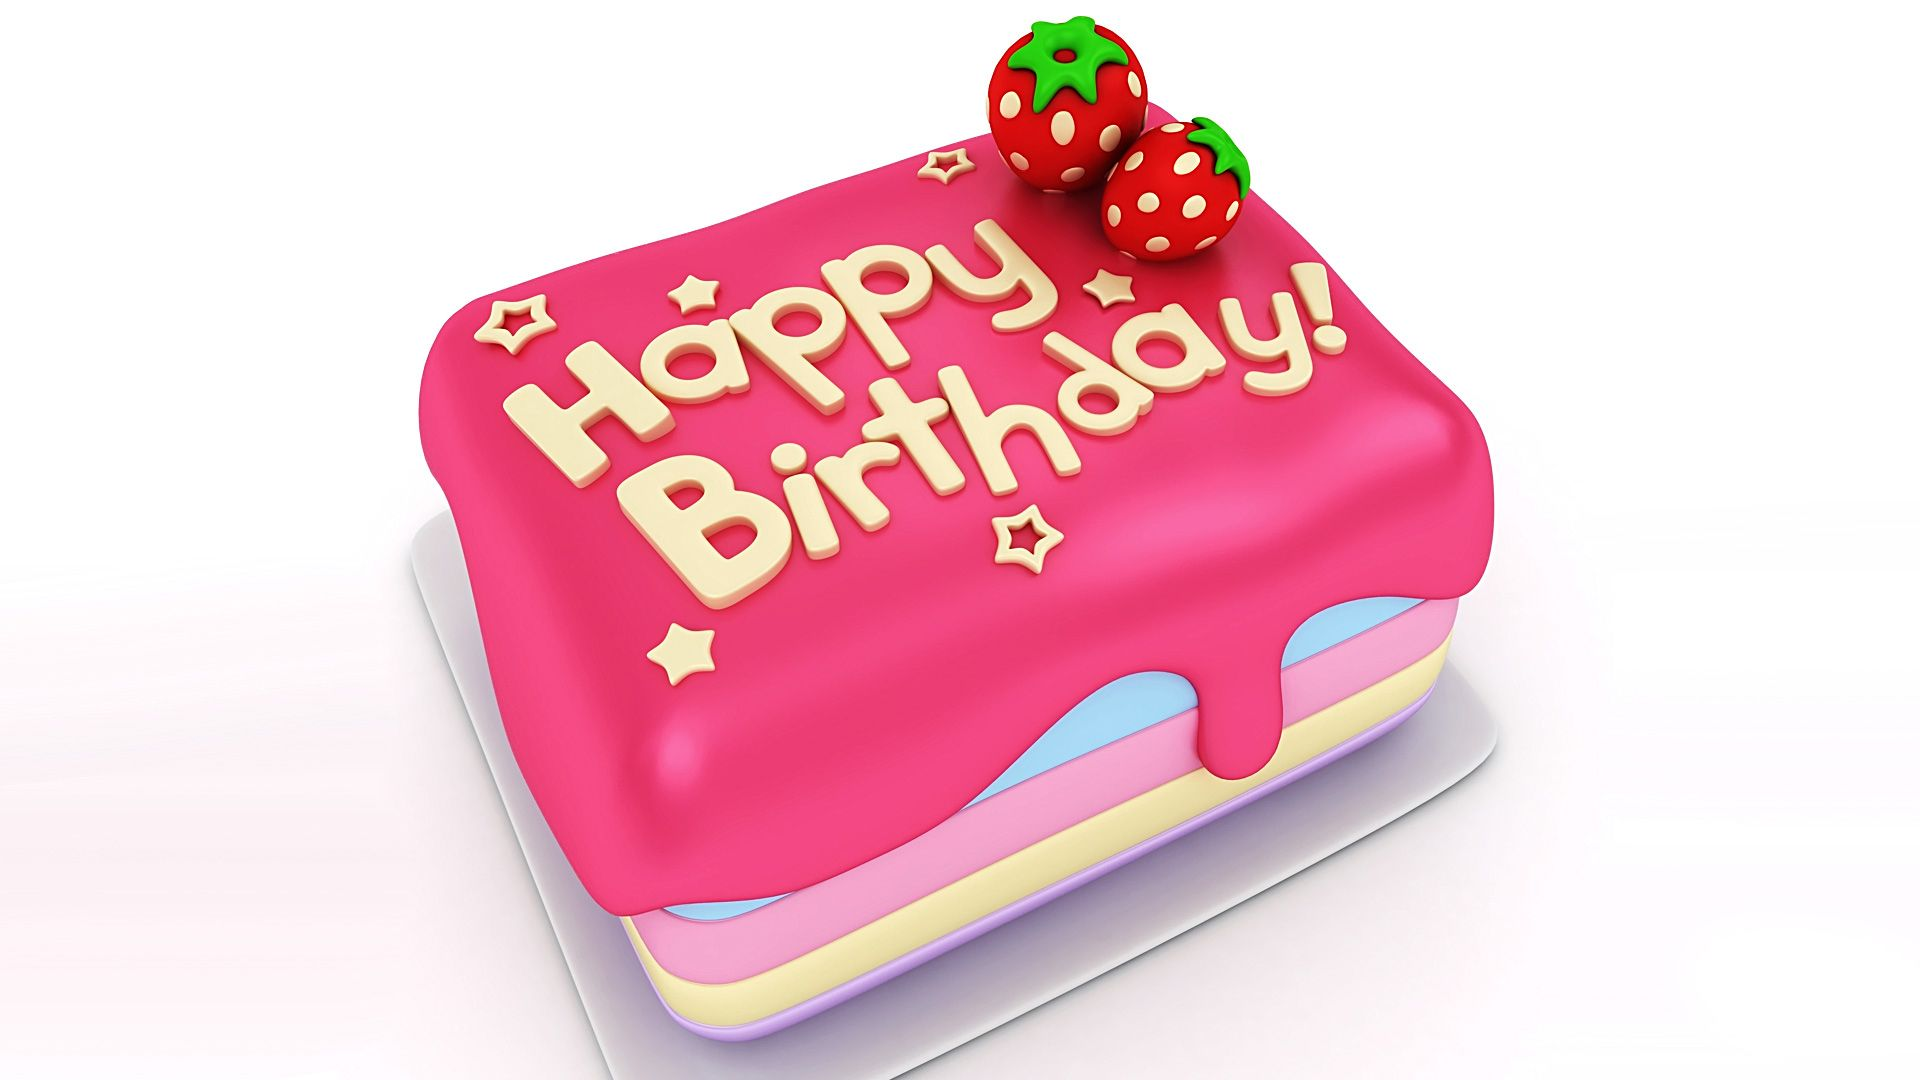 Happy Birthday Cake Hd Wallpaper Image Happy Birthday Wishes Quote